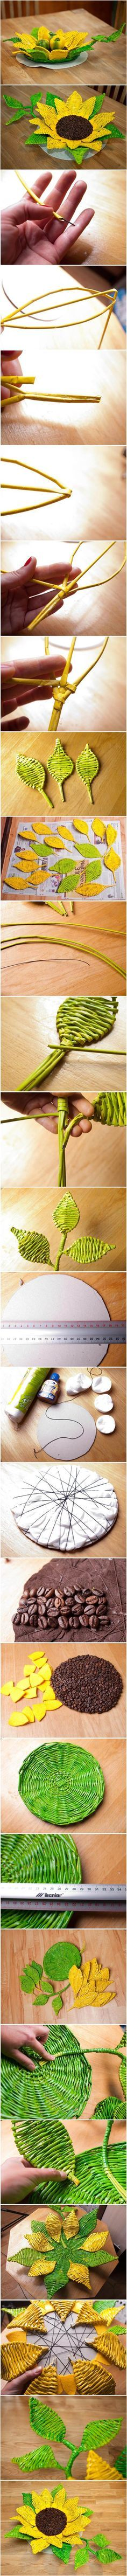 DIY Paper Woven Sunflower Tray | iCreativeIdeas.com Like Us on Facebook == https://www.facebook.com/icreativeideas